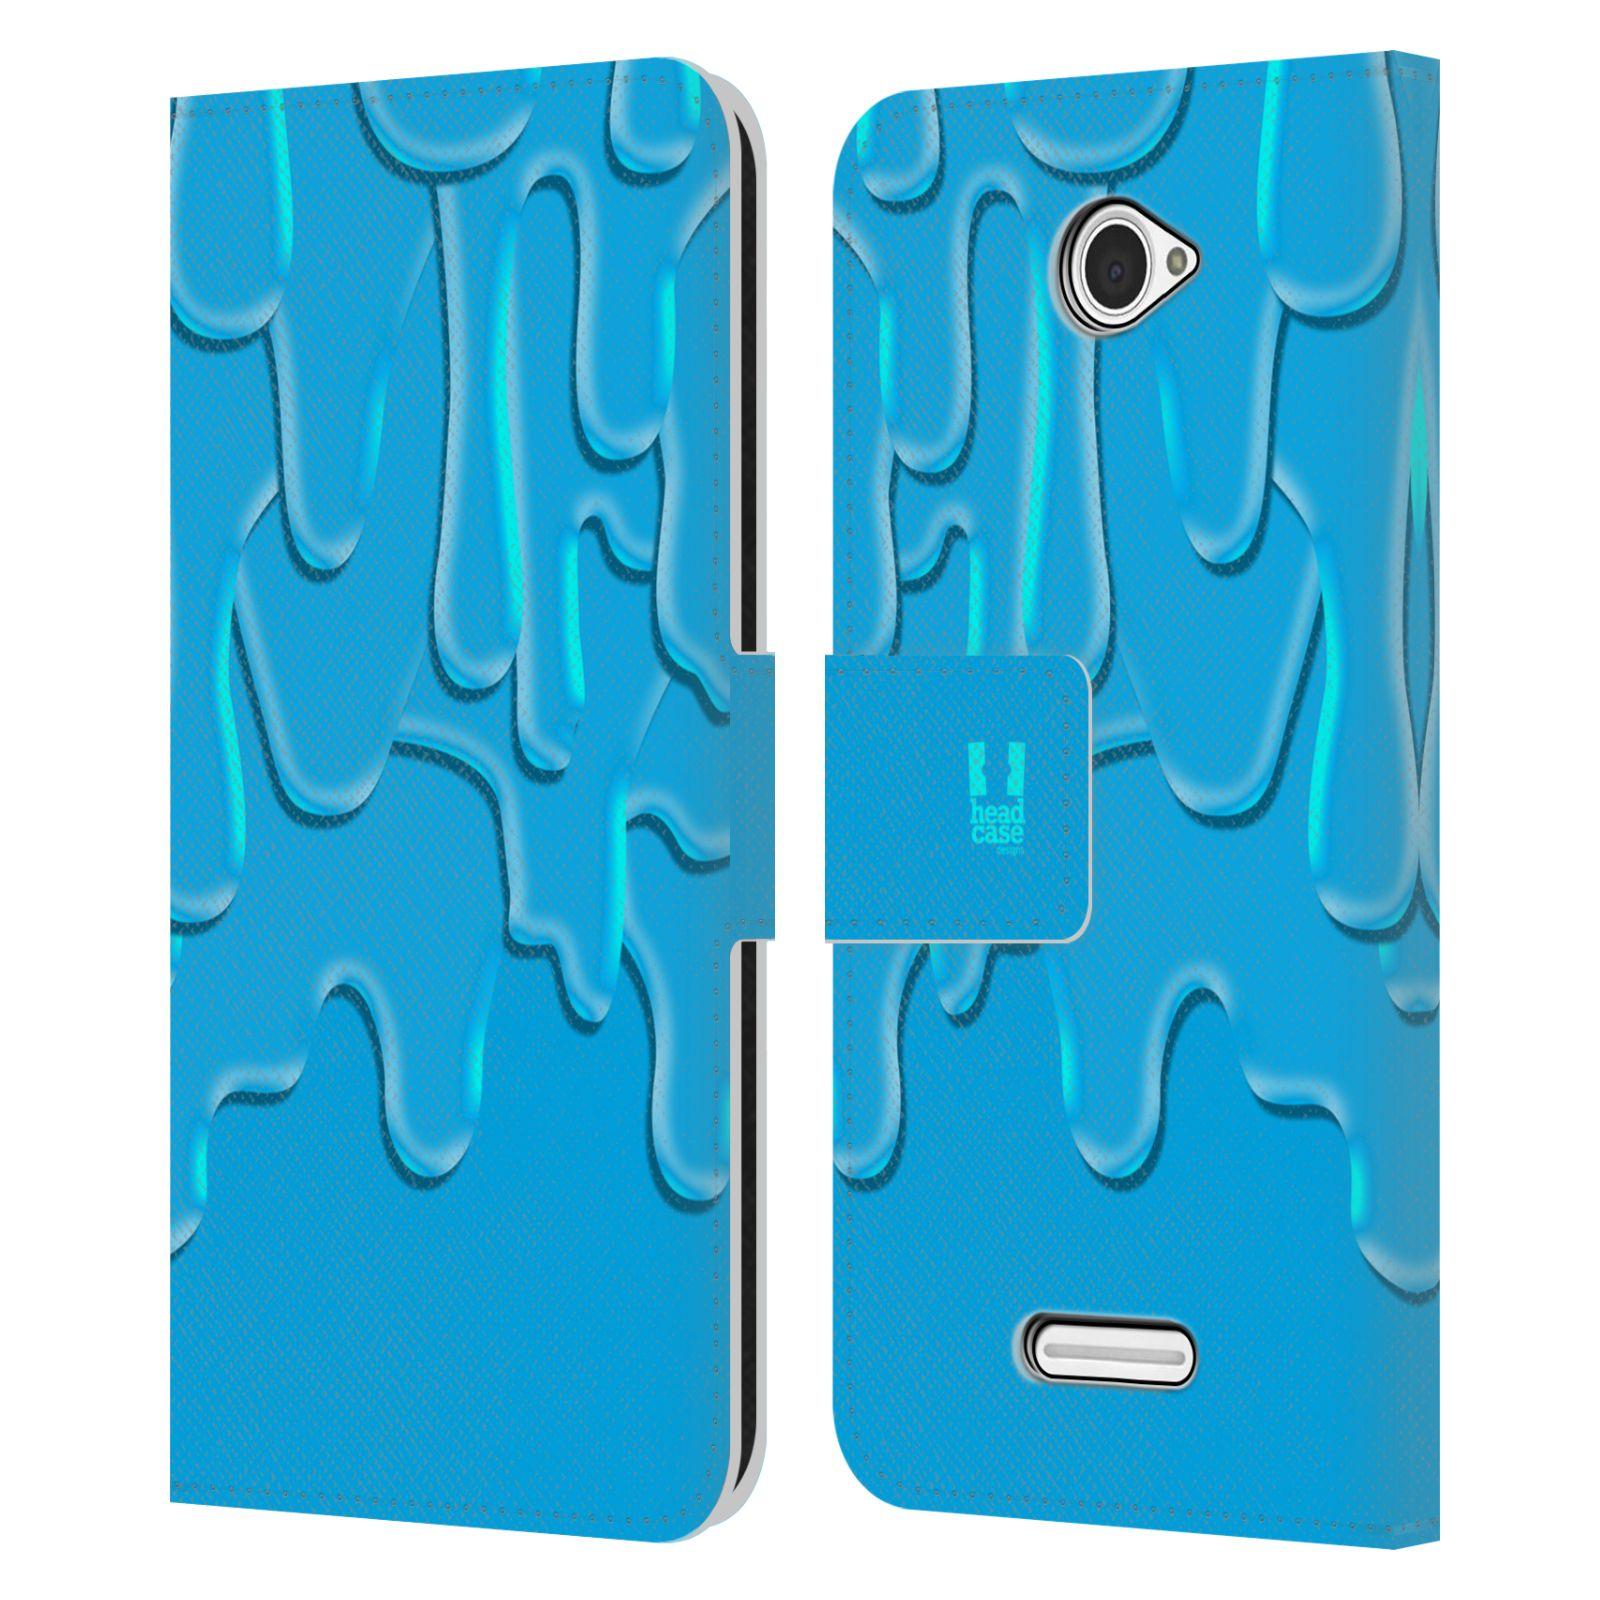 HEAD CASE Flipové pouzdro pro mobil SONY XPERIA E4 ZÁPLAVA BARVA tyrkysová modrá